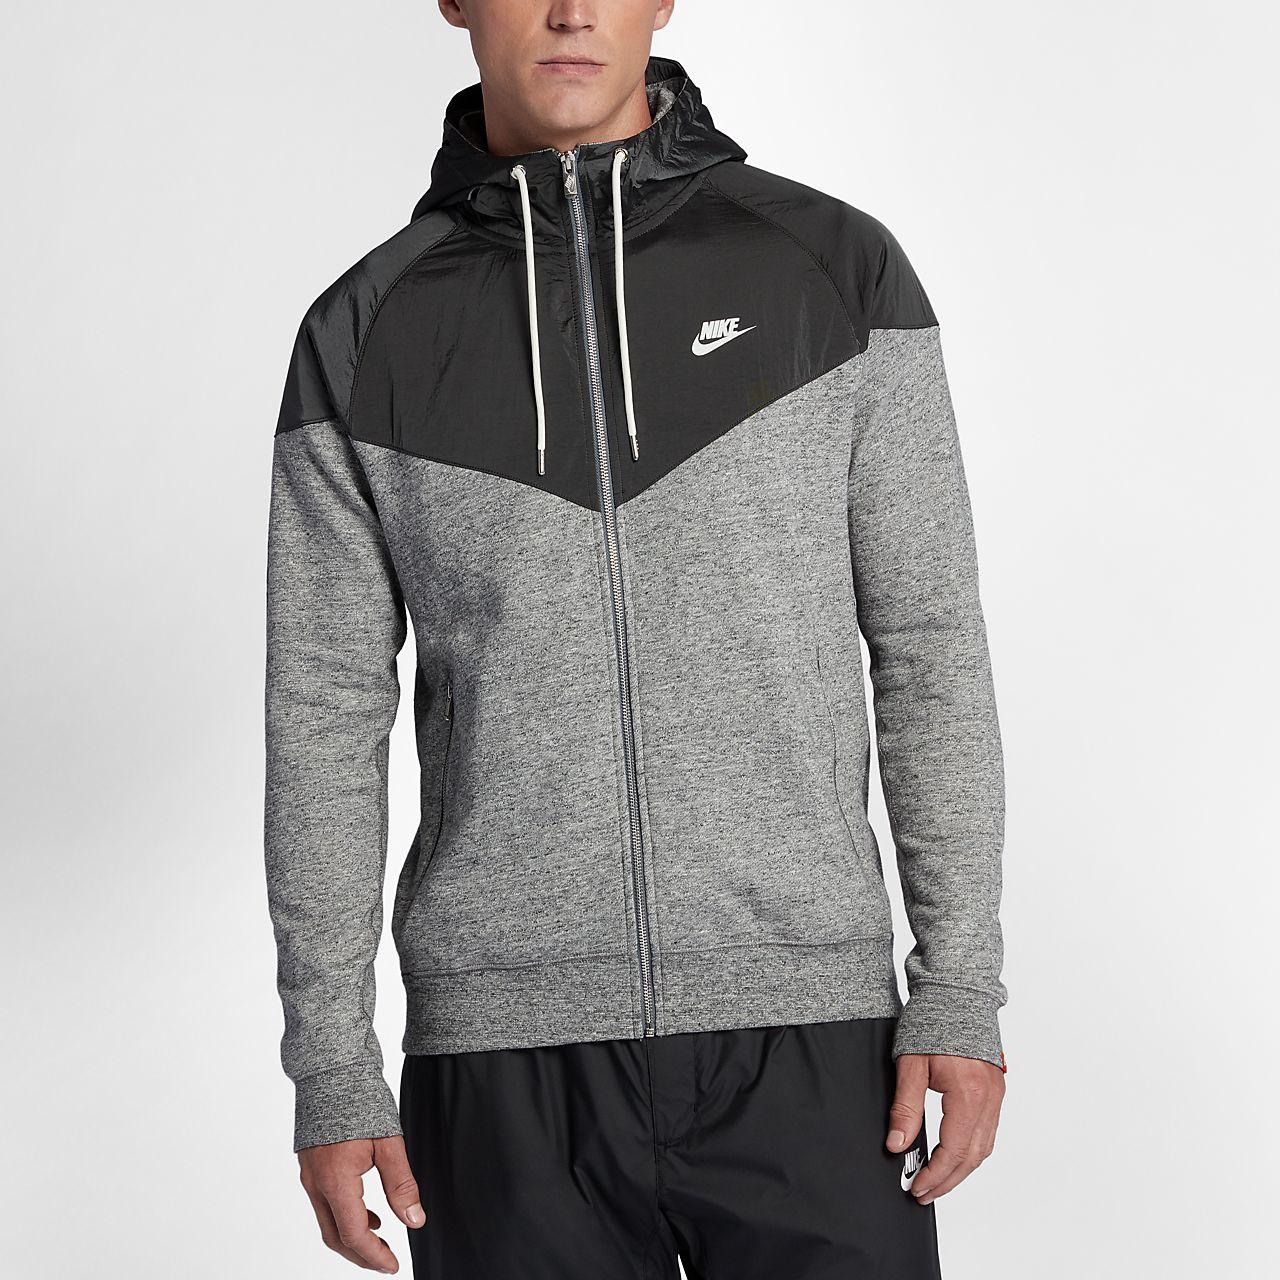 0f02410ac2ab Nike Sportswear Windrunner Men s Full-zip Hoodie unit4motors.co.uk